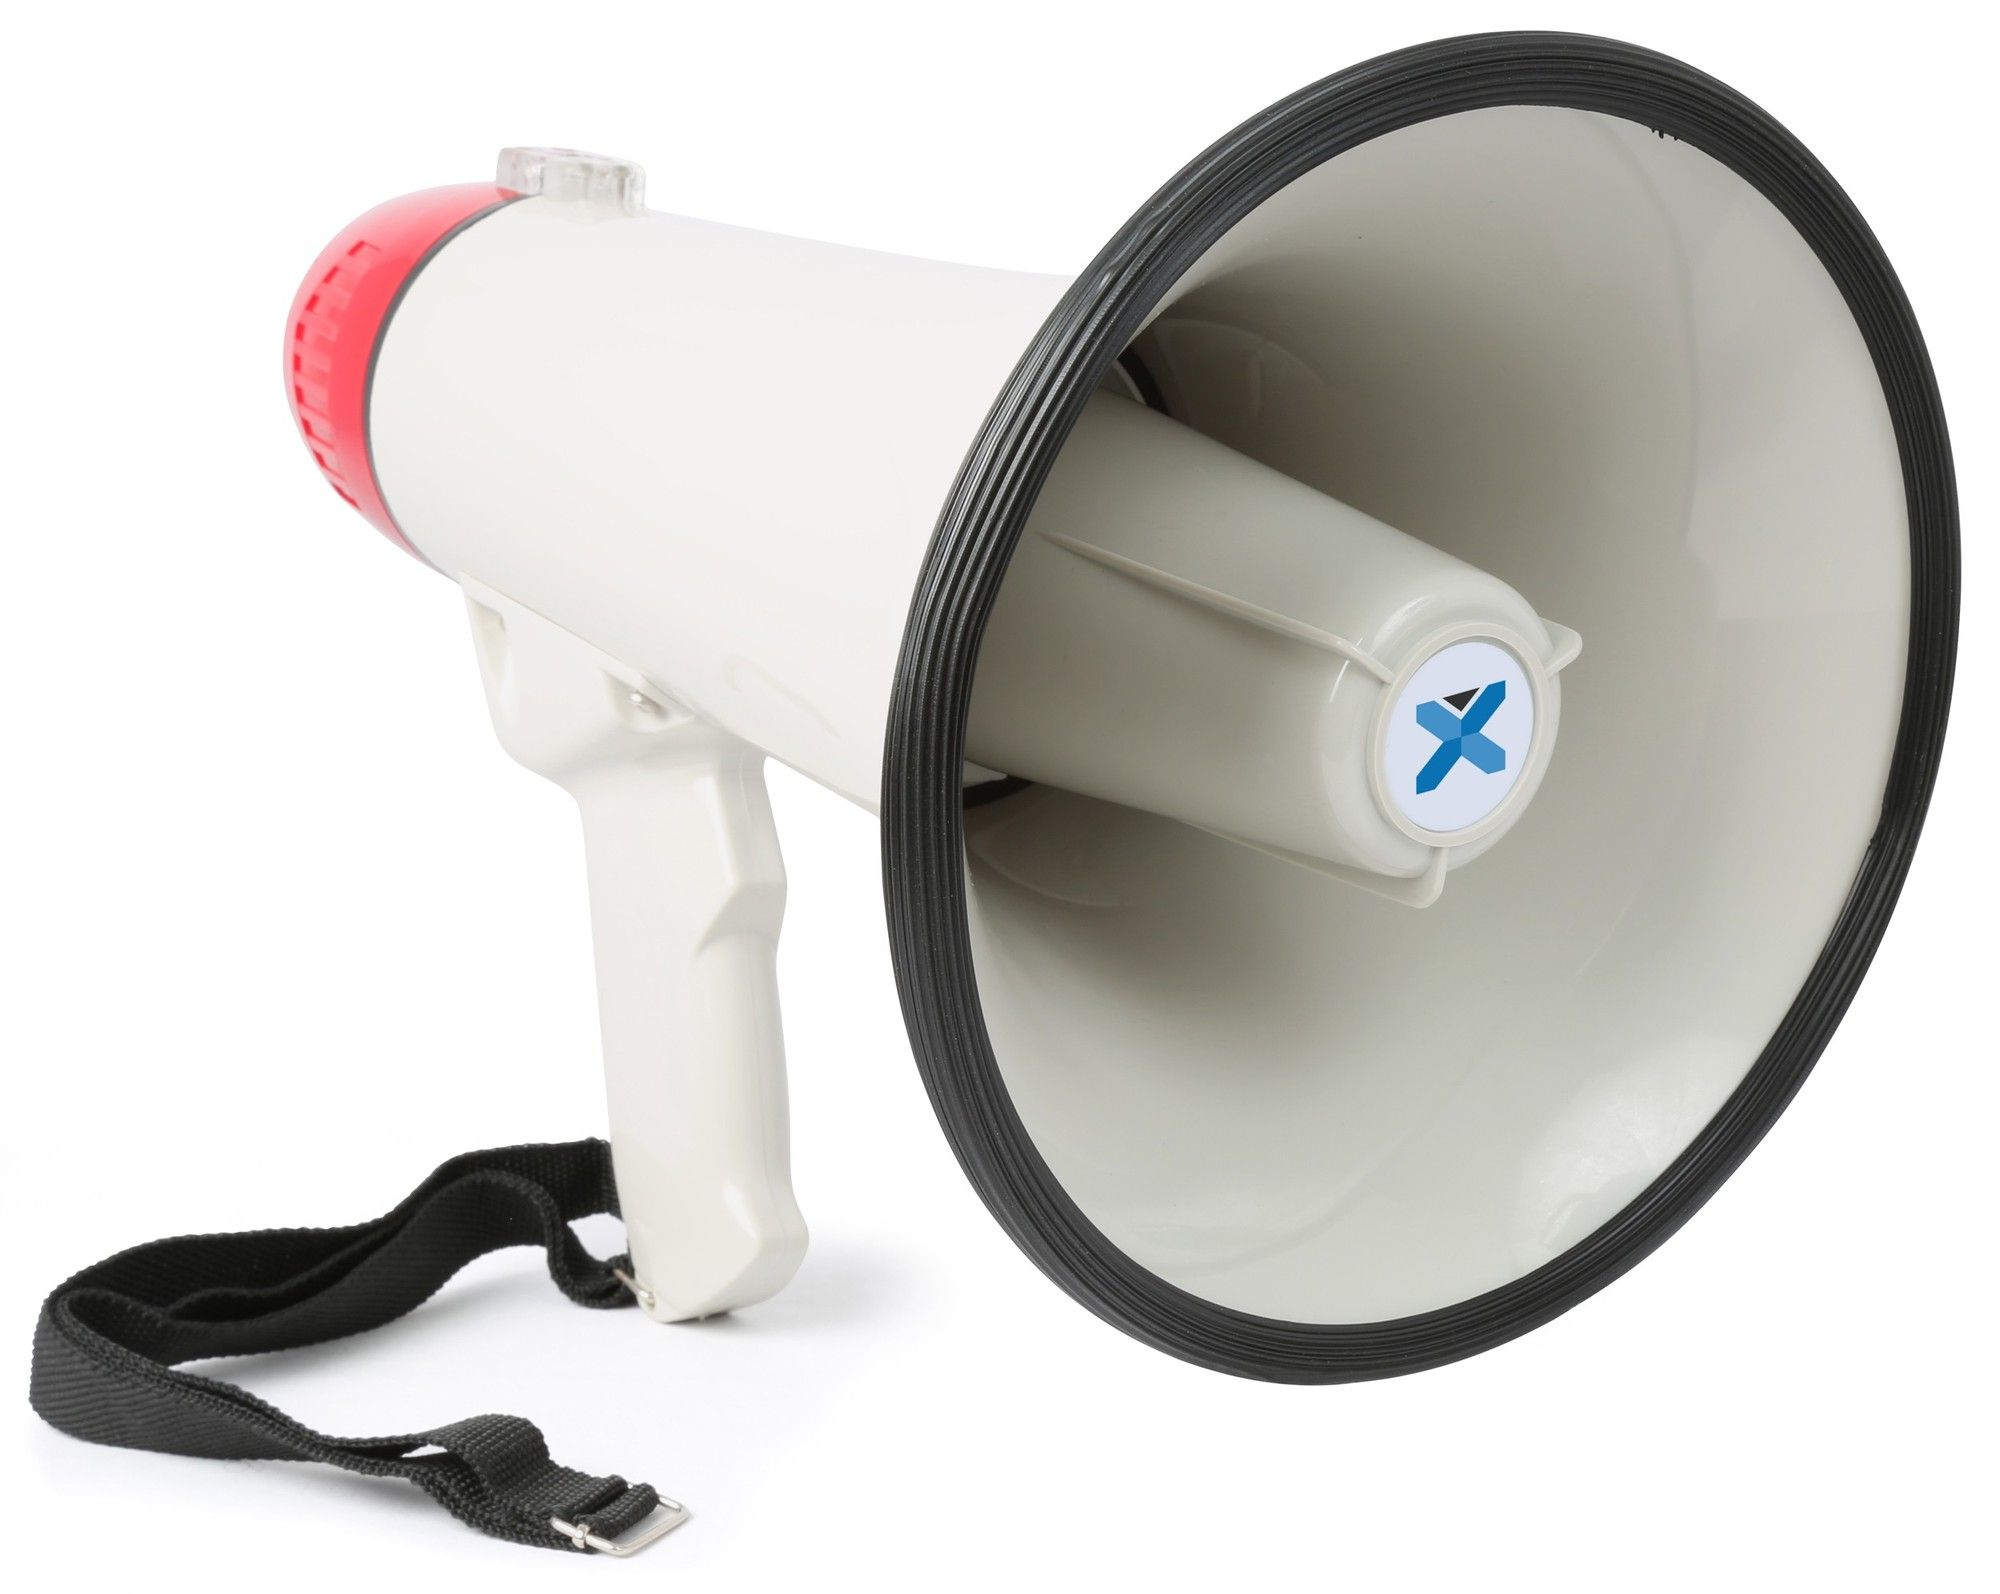 Vexus MEG045 45W megafoon met sirene en USB-SD